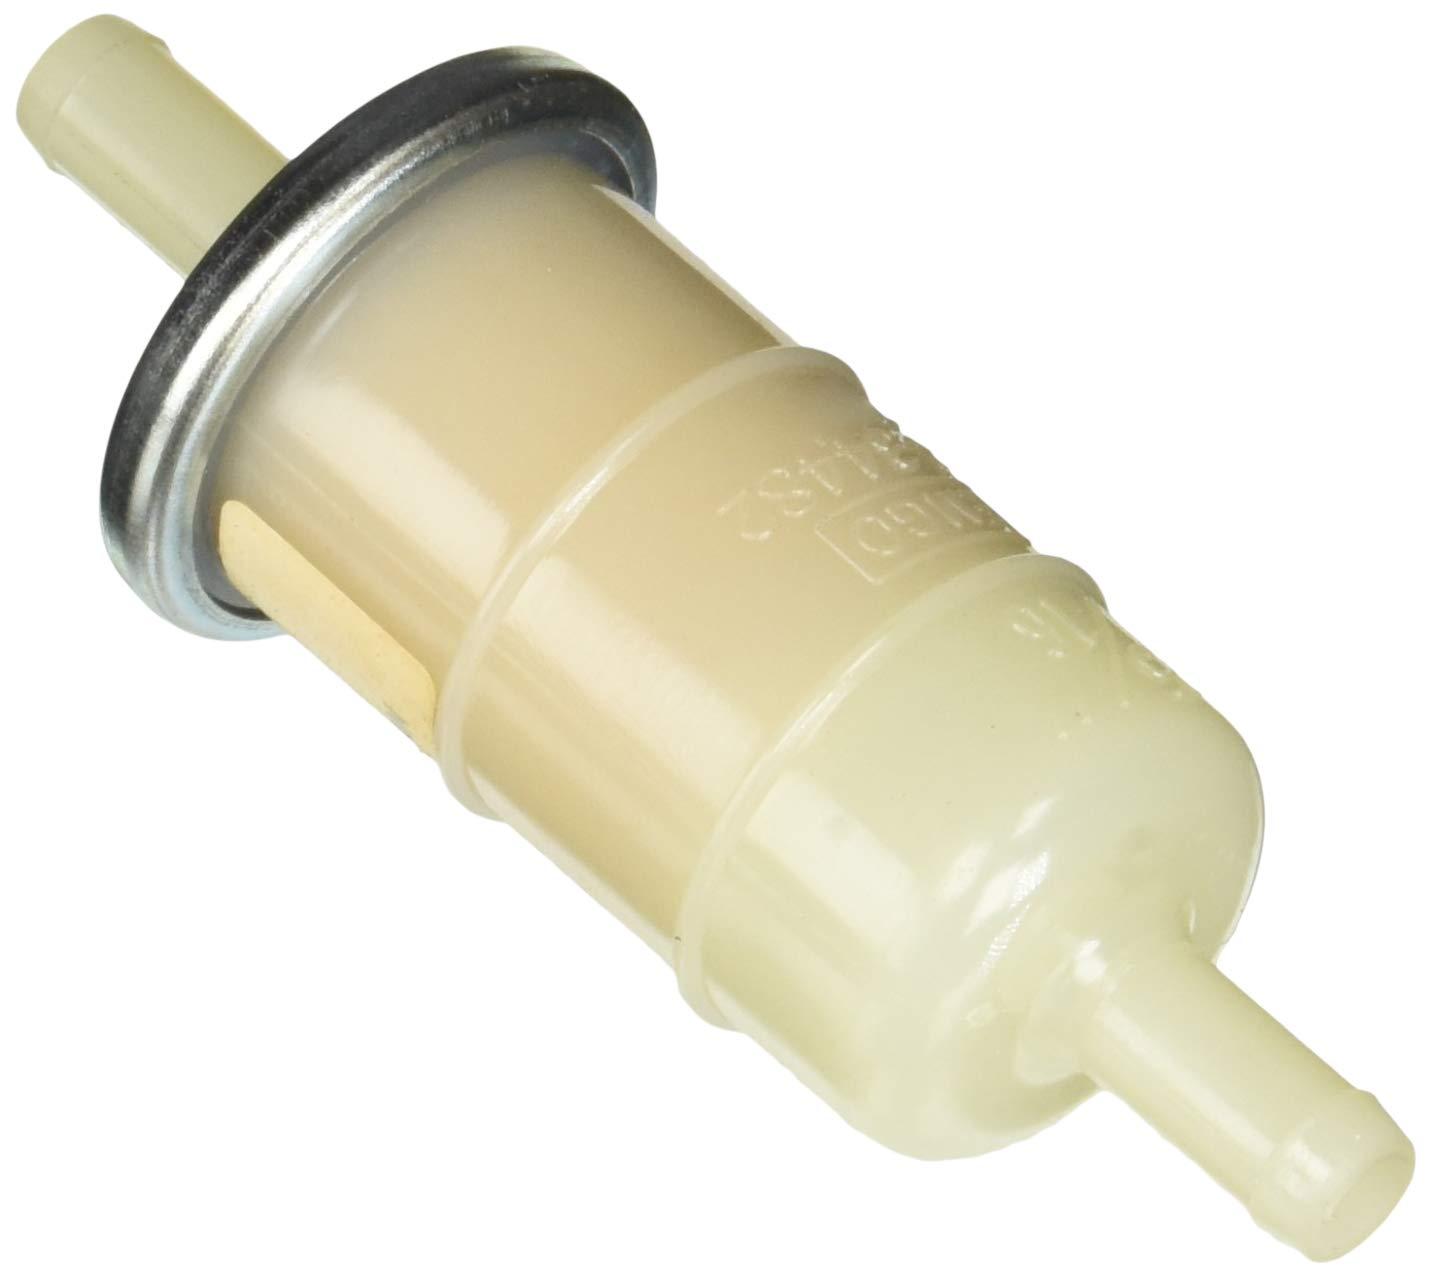 3-27//32 x 1-7//16 x 3-27//32In Baldwin Filters BF7686 Fuel Filter